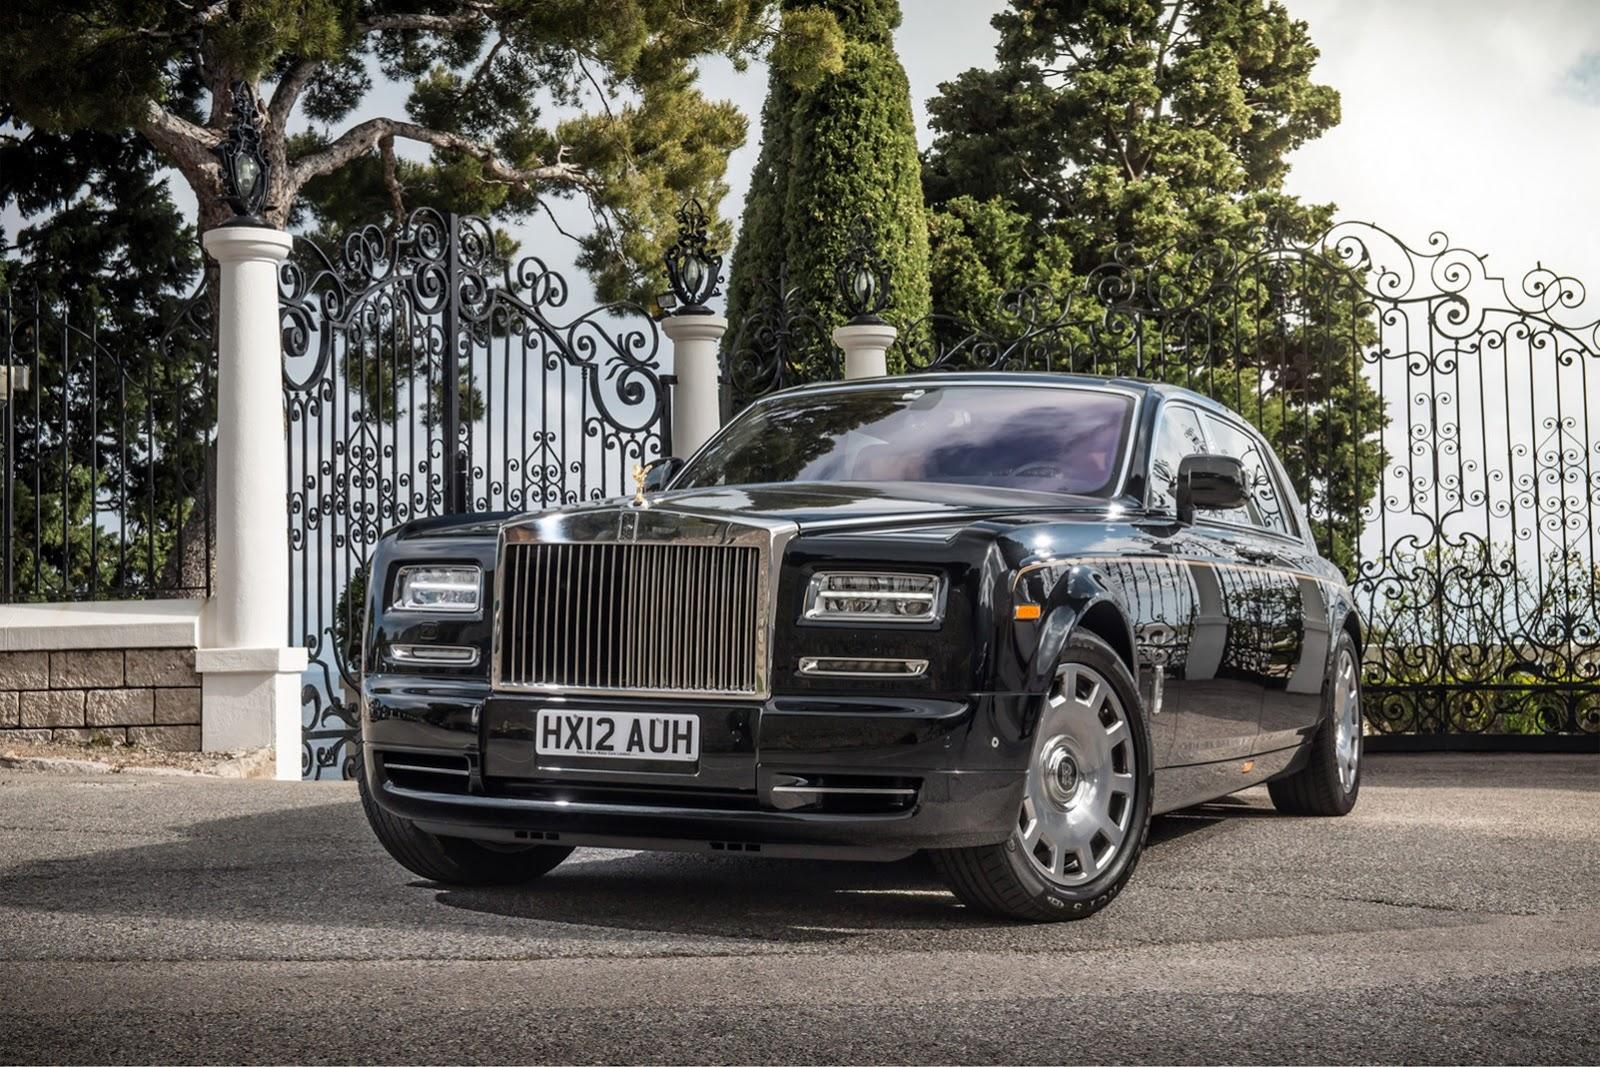 New Rolls-Royce Phantom Not Expected Before 2020 - Rides Magazine